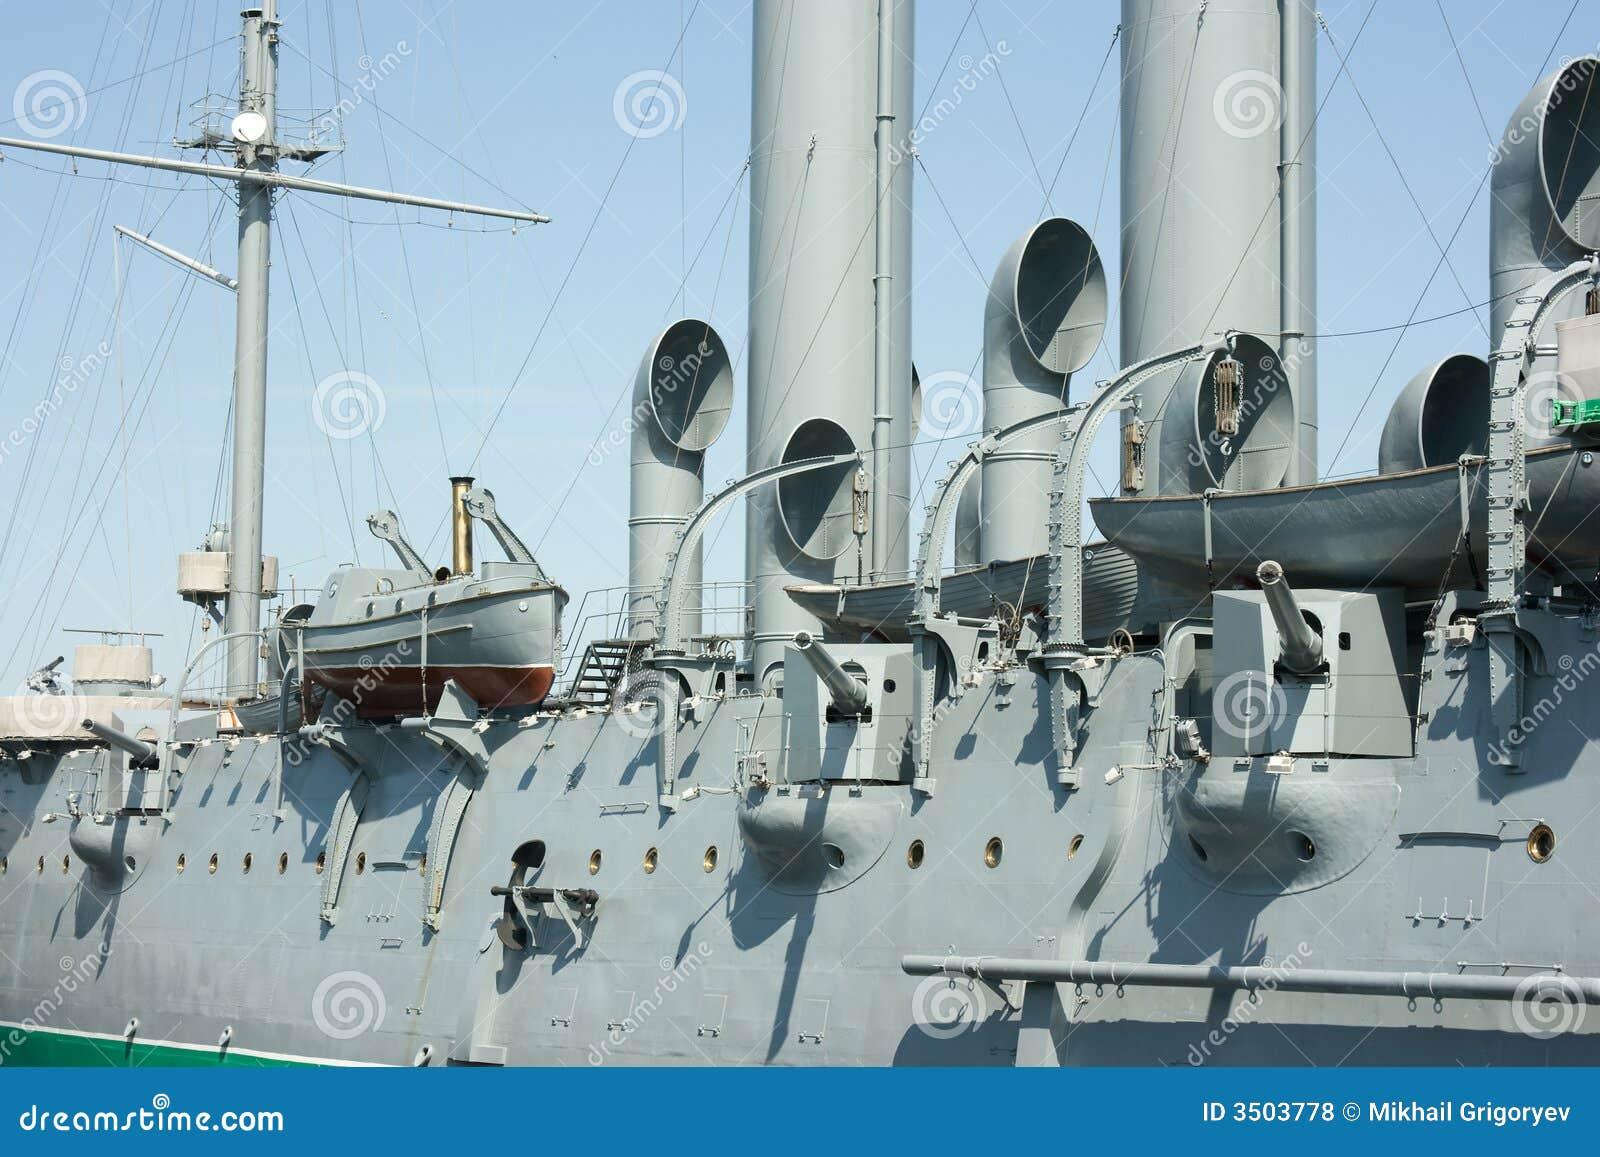 Battle-cruiser 02